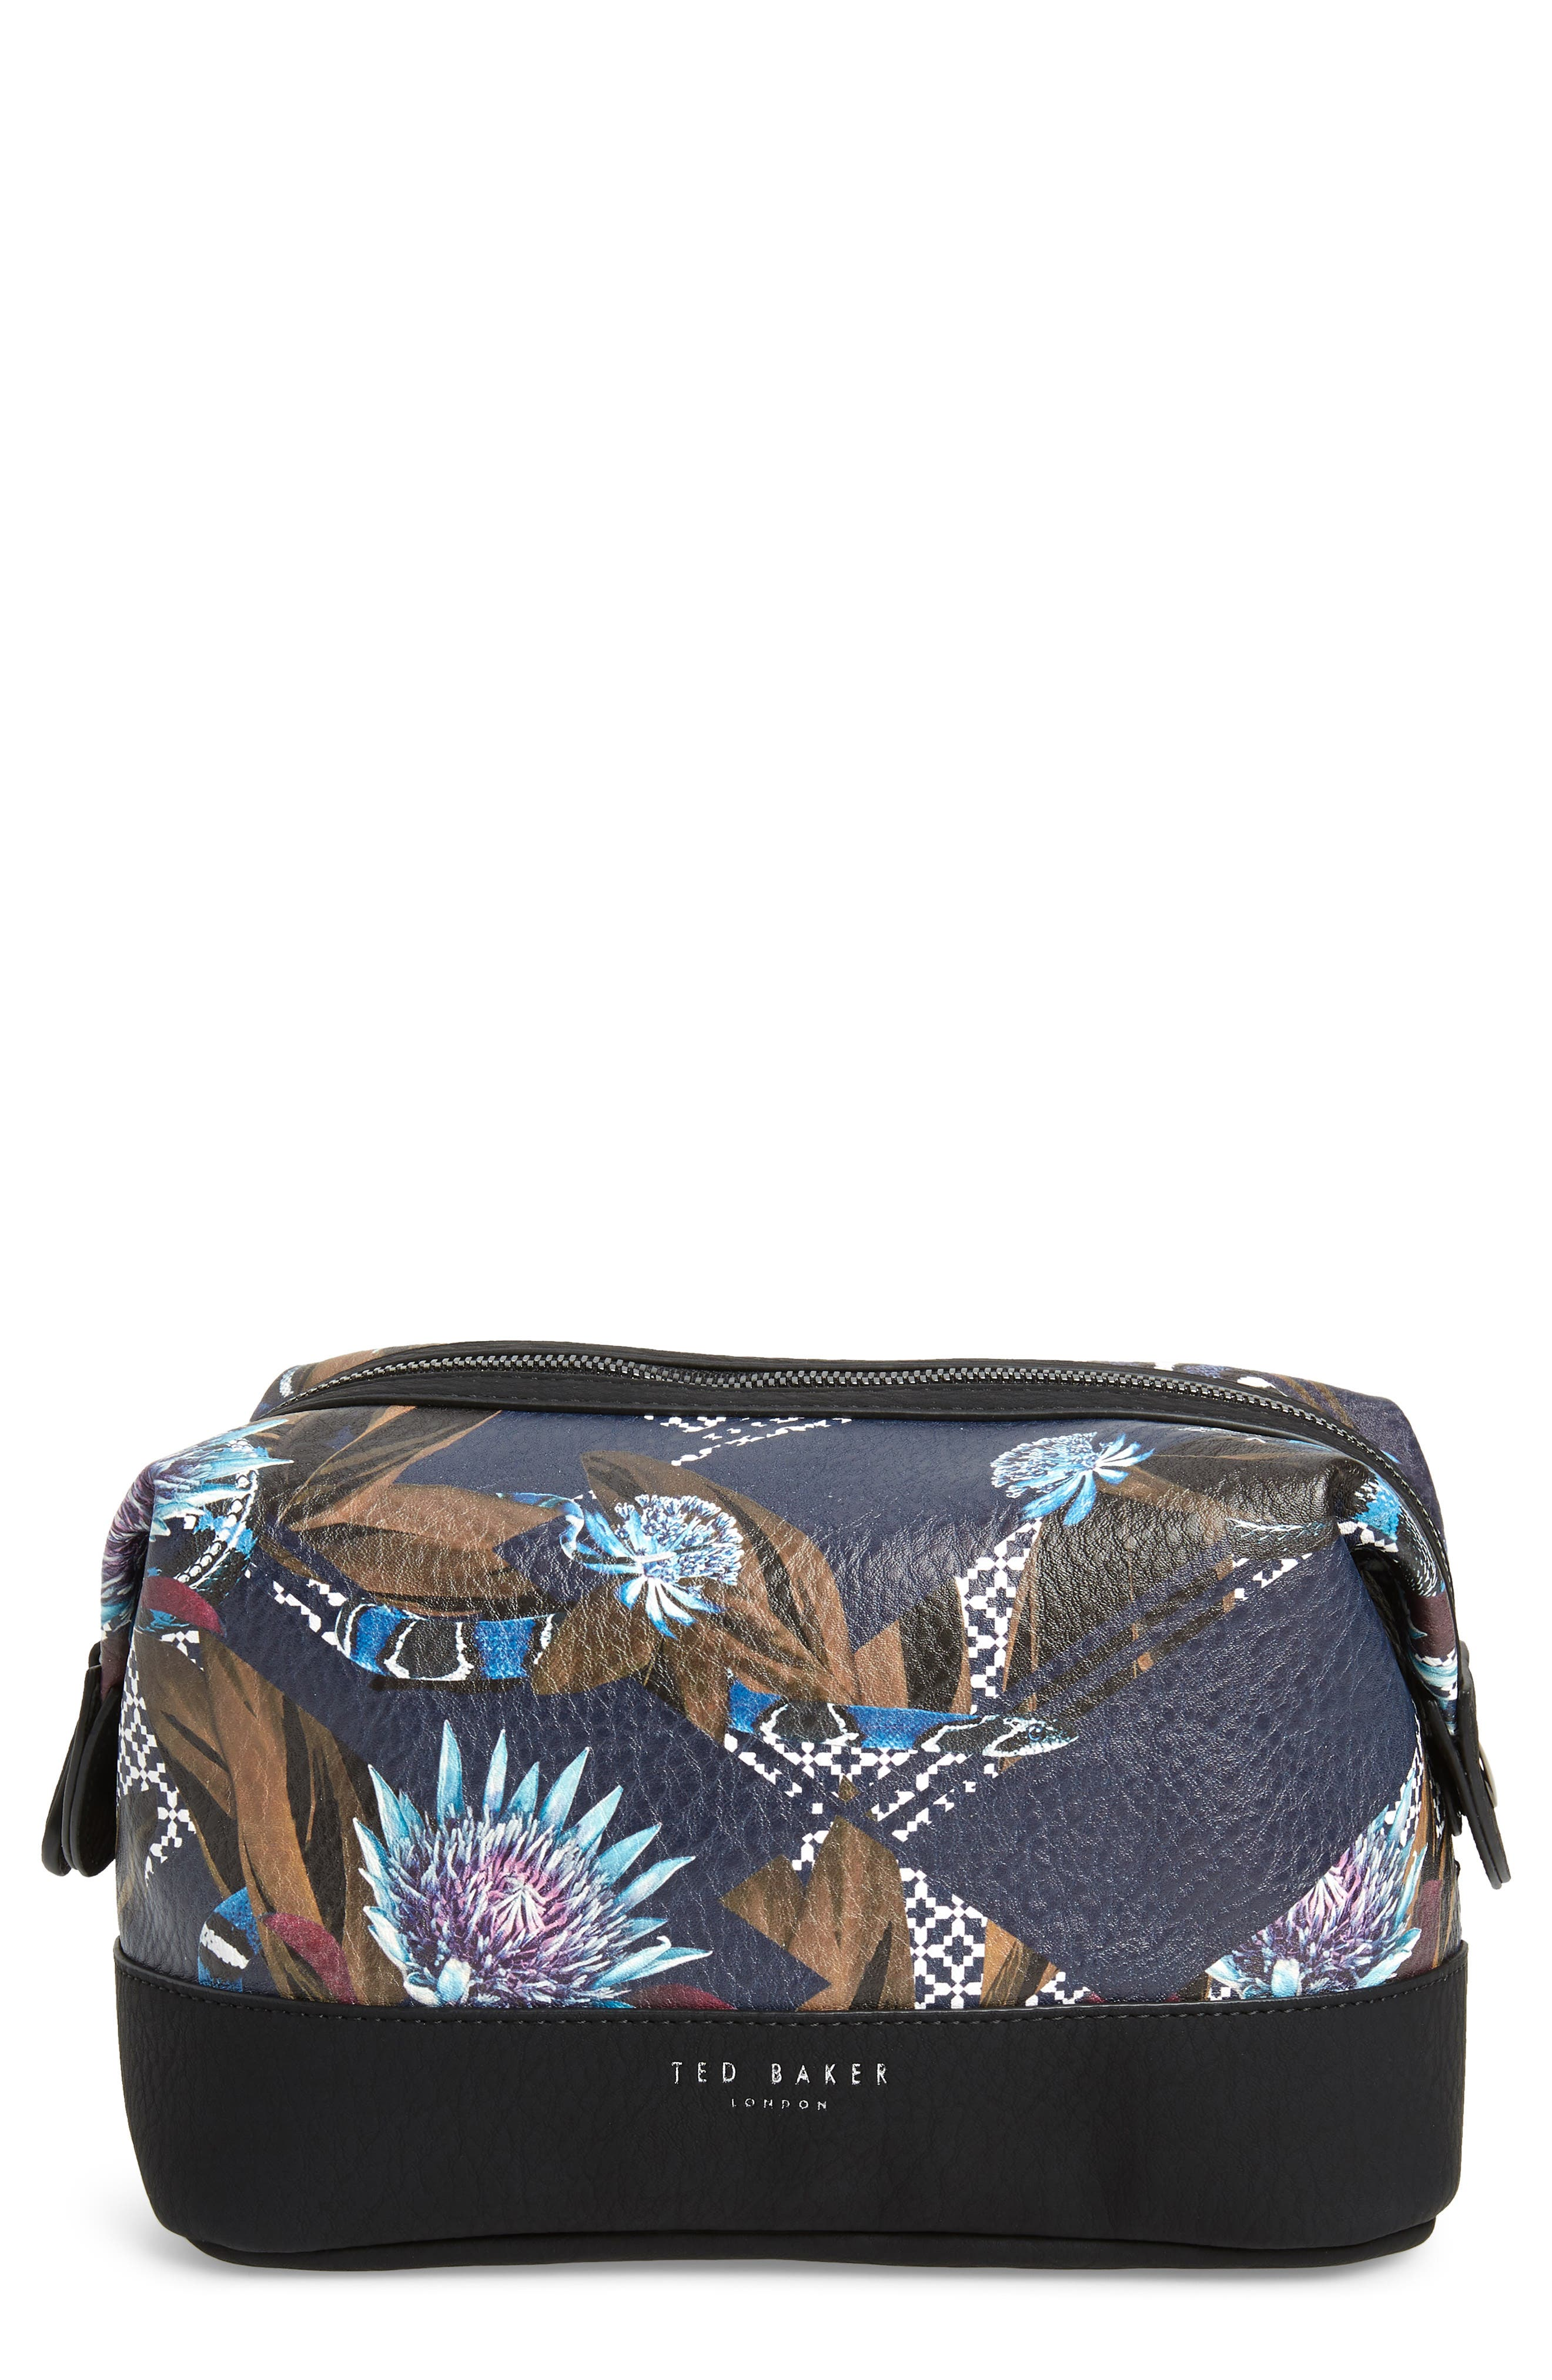 TED BAKER LONDON Print Travel Bag, Main, color, NAVY